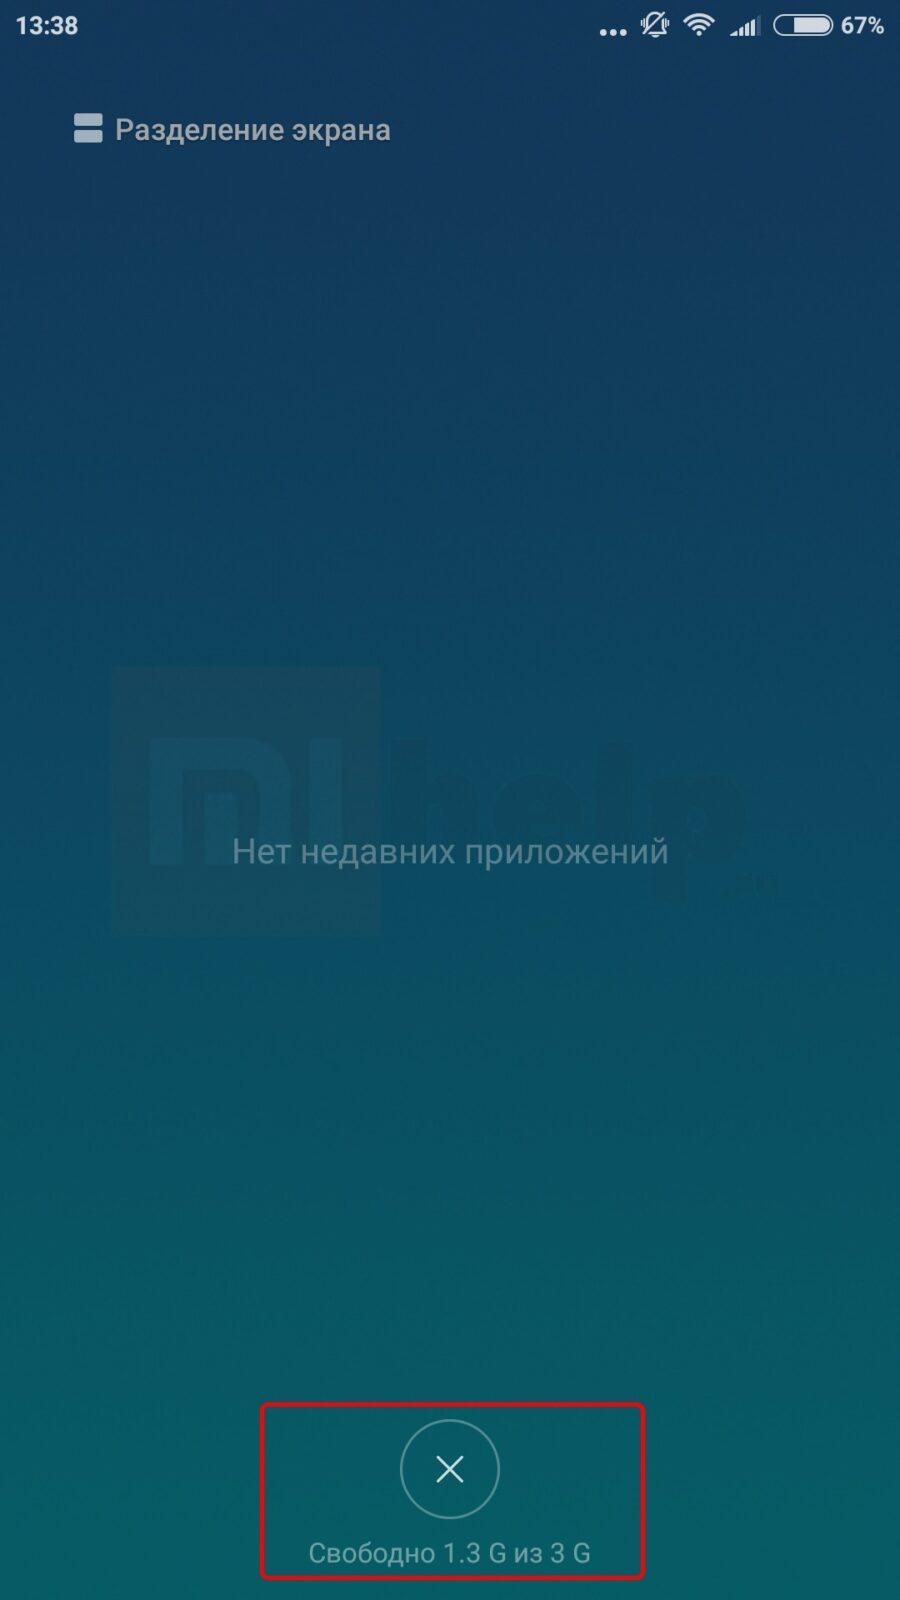 экран последних приложений